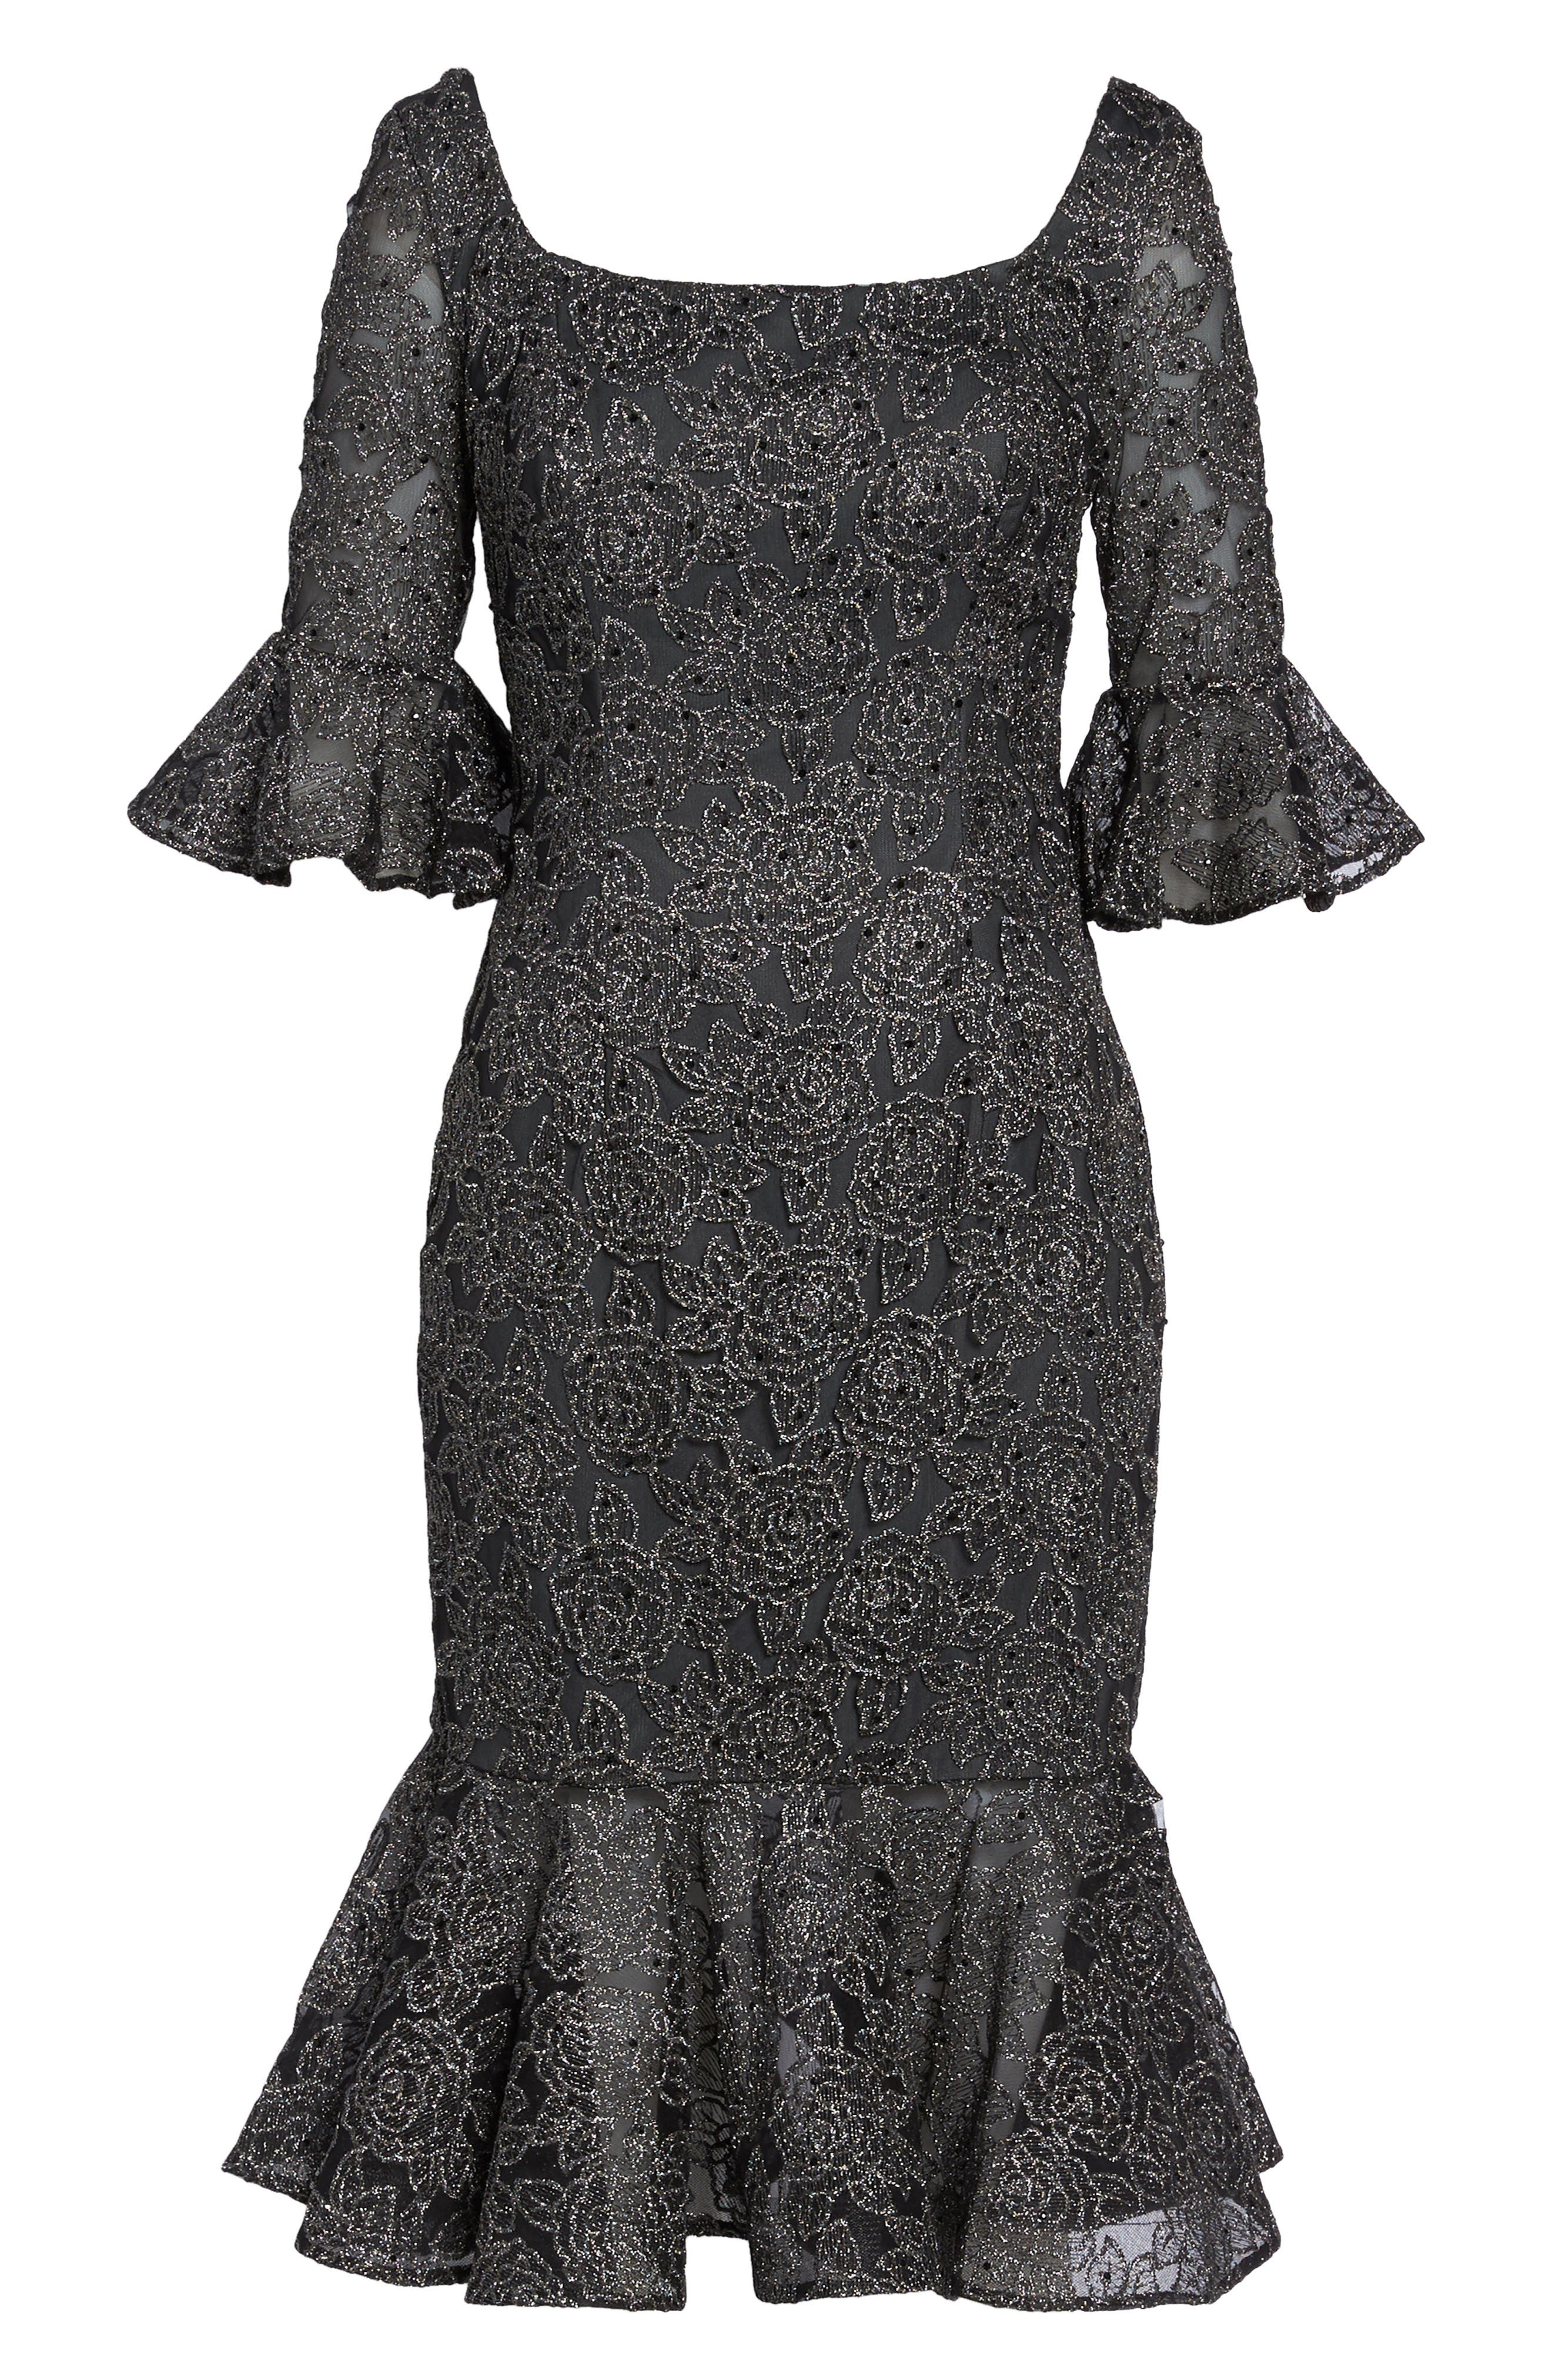 Mermaid Hem Embroidered Mesh Sheath Dress,                             Alternate thumbnail 6, color,                             031